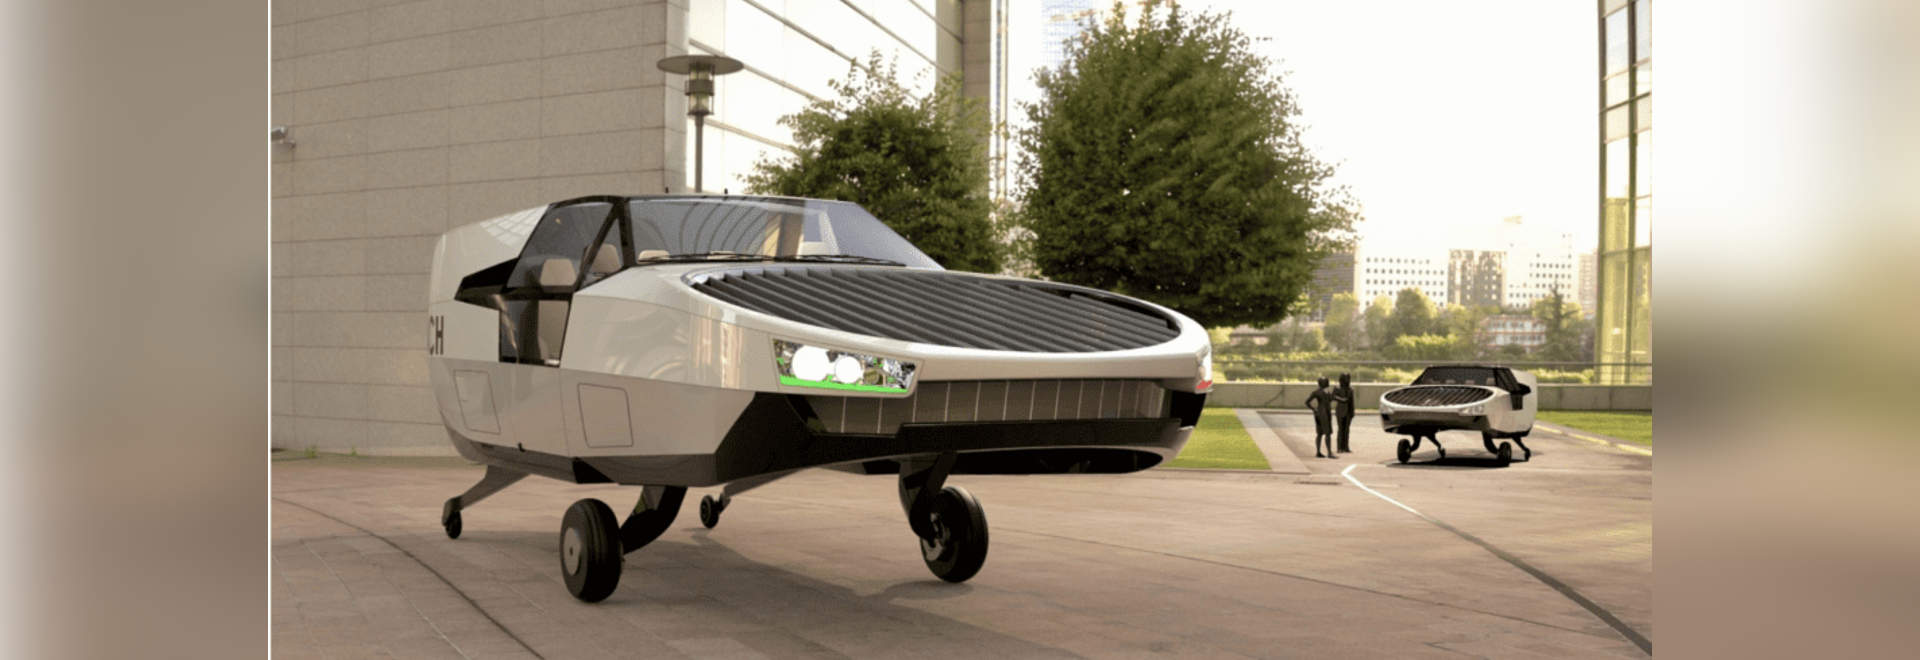 Urban Aeronautics Raises $10 Million for Wingless Air Taxi CityHawk